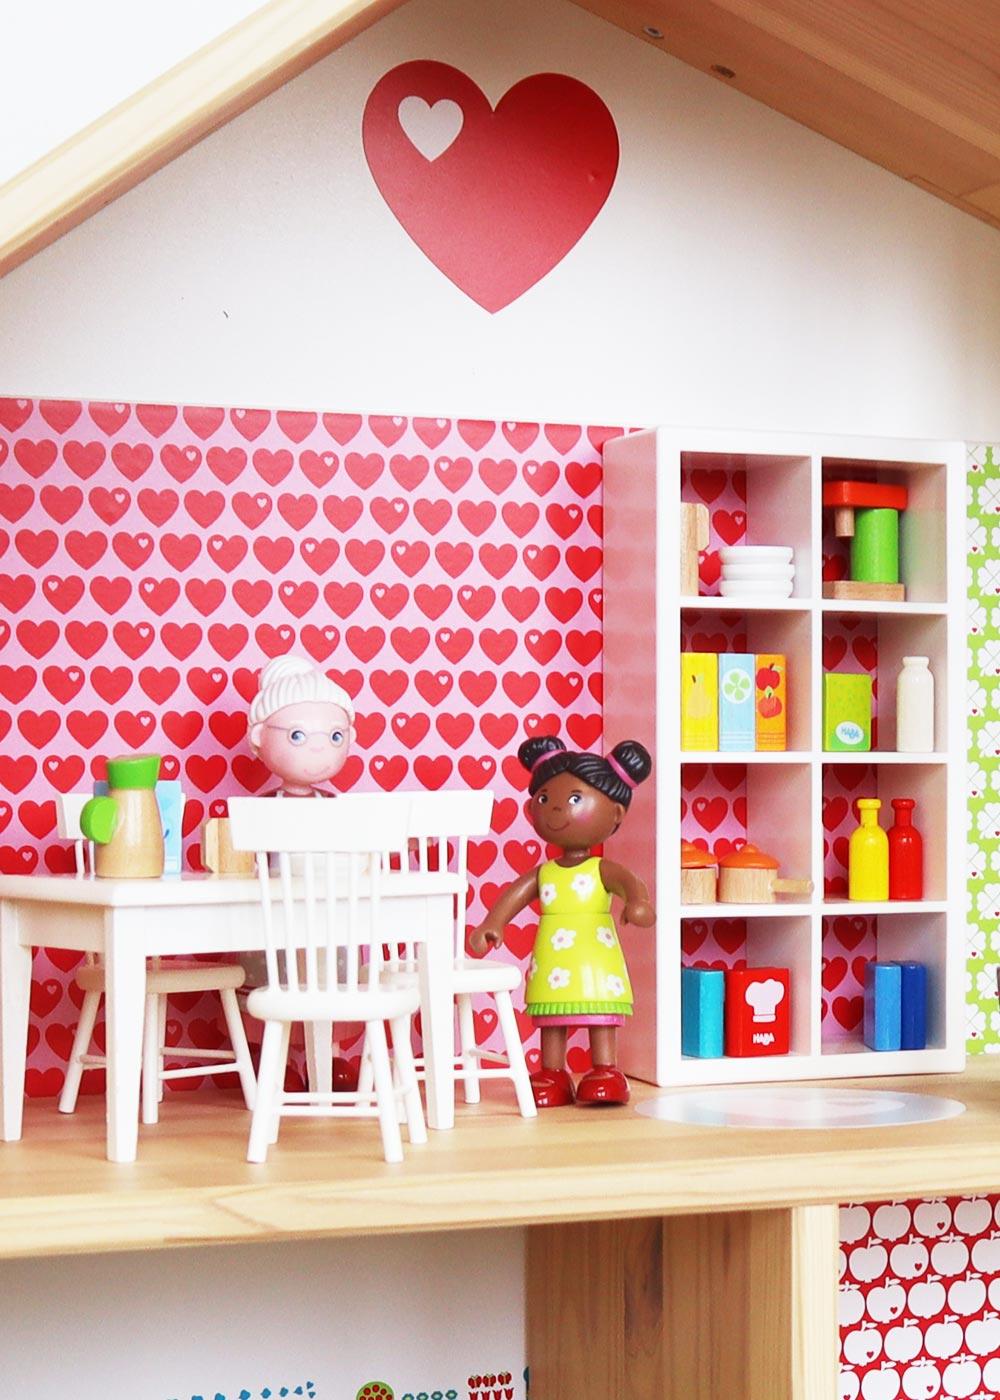 Ikea Flisat Puppenhaus Tapete ByGraziela rot grün Teilansicht Oma